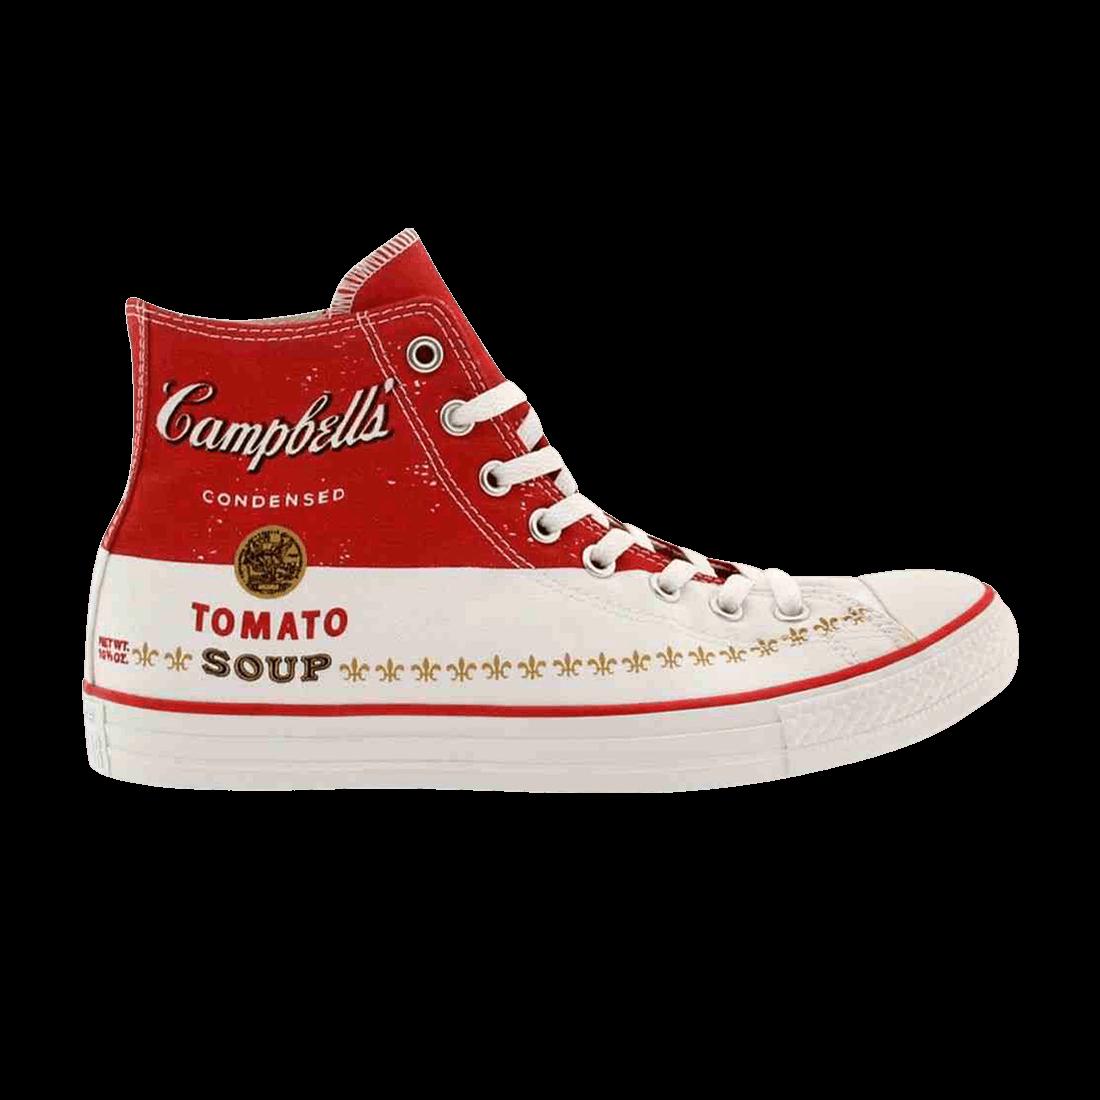 a77c5e6b282a Andy Warhol x CT All Star High - Converse - 147050C